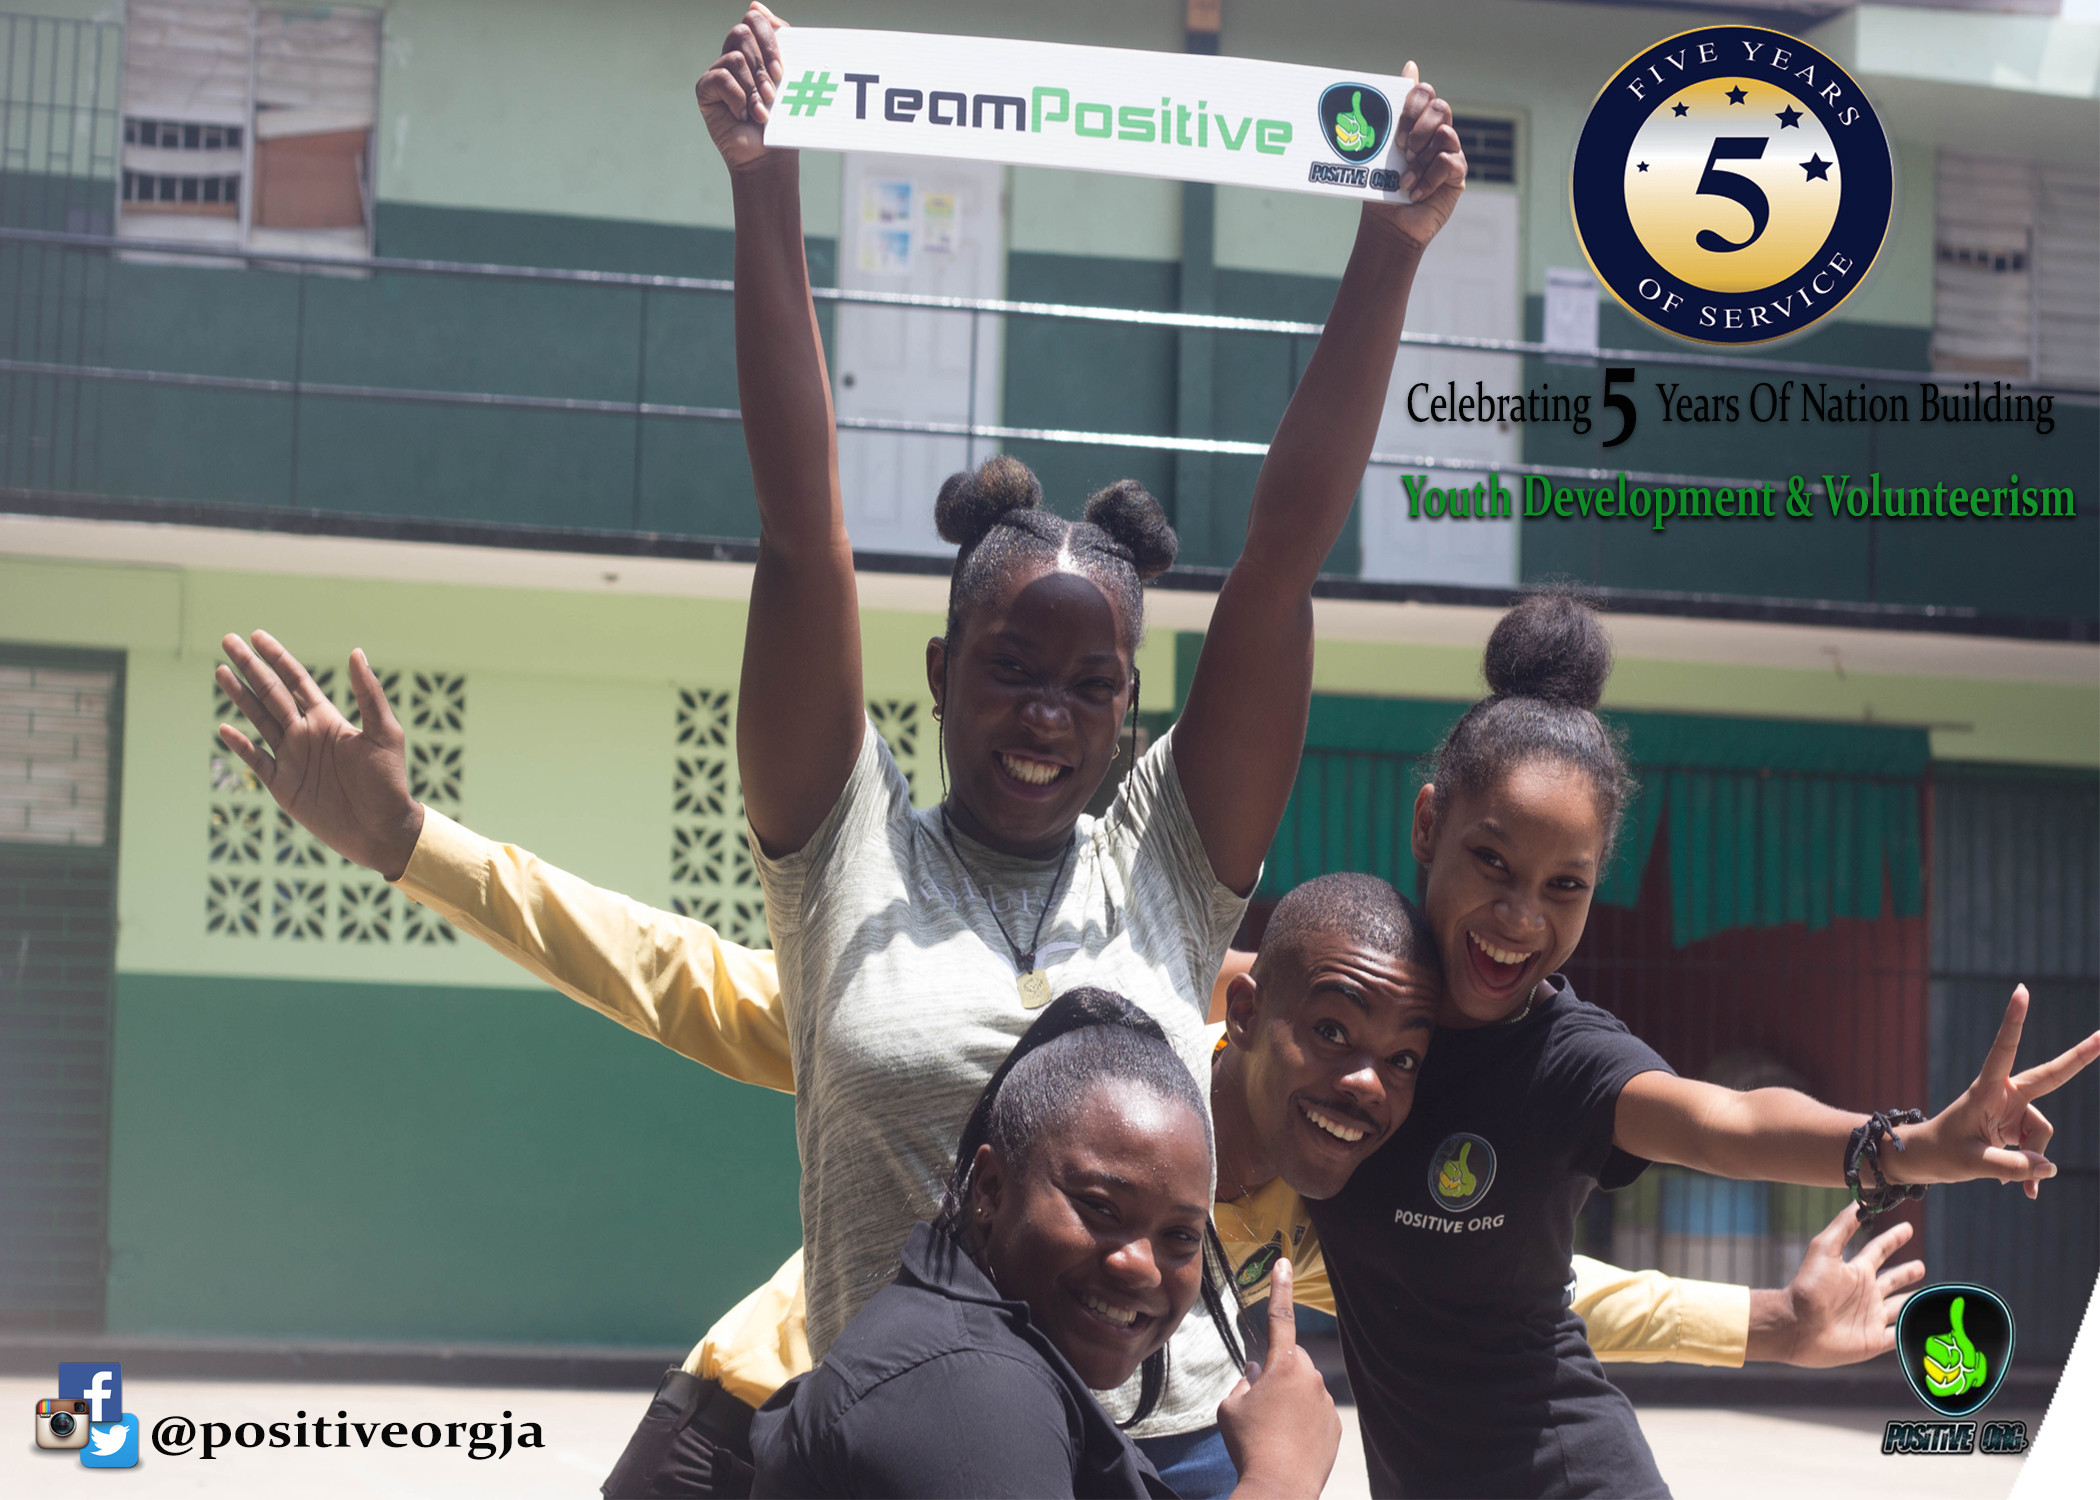 Youths Inspiring Positive Change Ja. | Celebrating 5 Years Of Service.